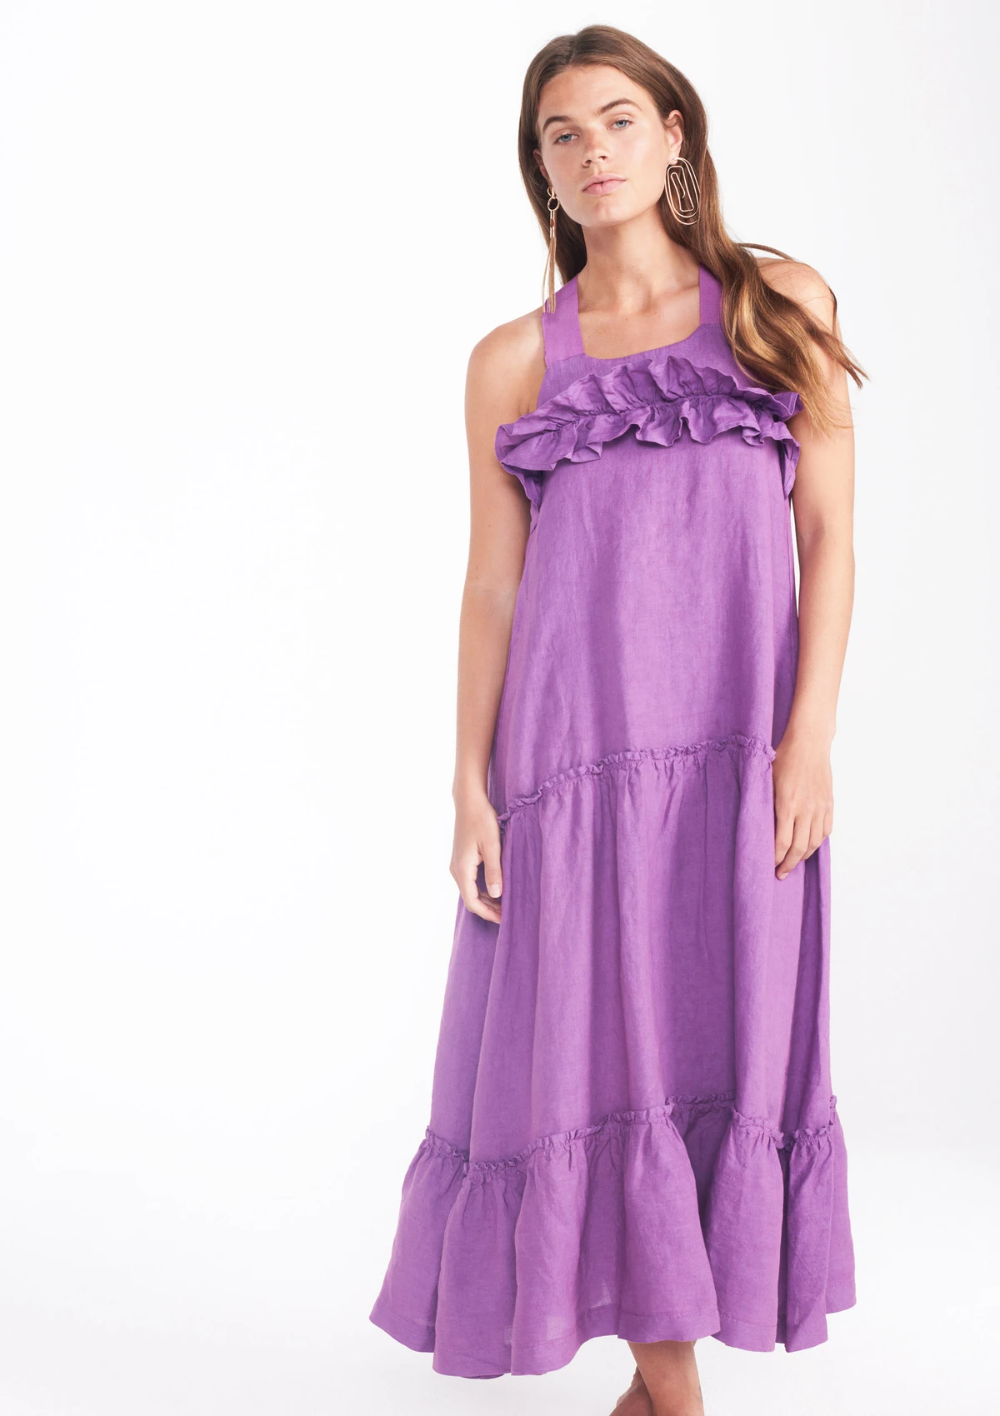 Anemone Dress In Violet Bower Swimwear [ 1416 x 1000 Pixel ]